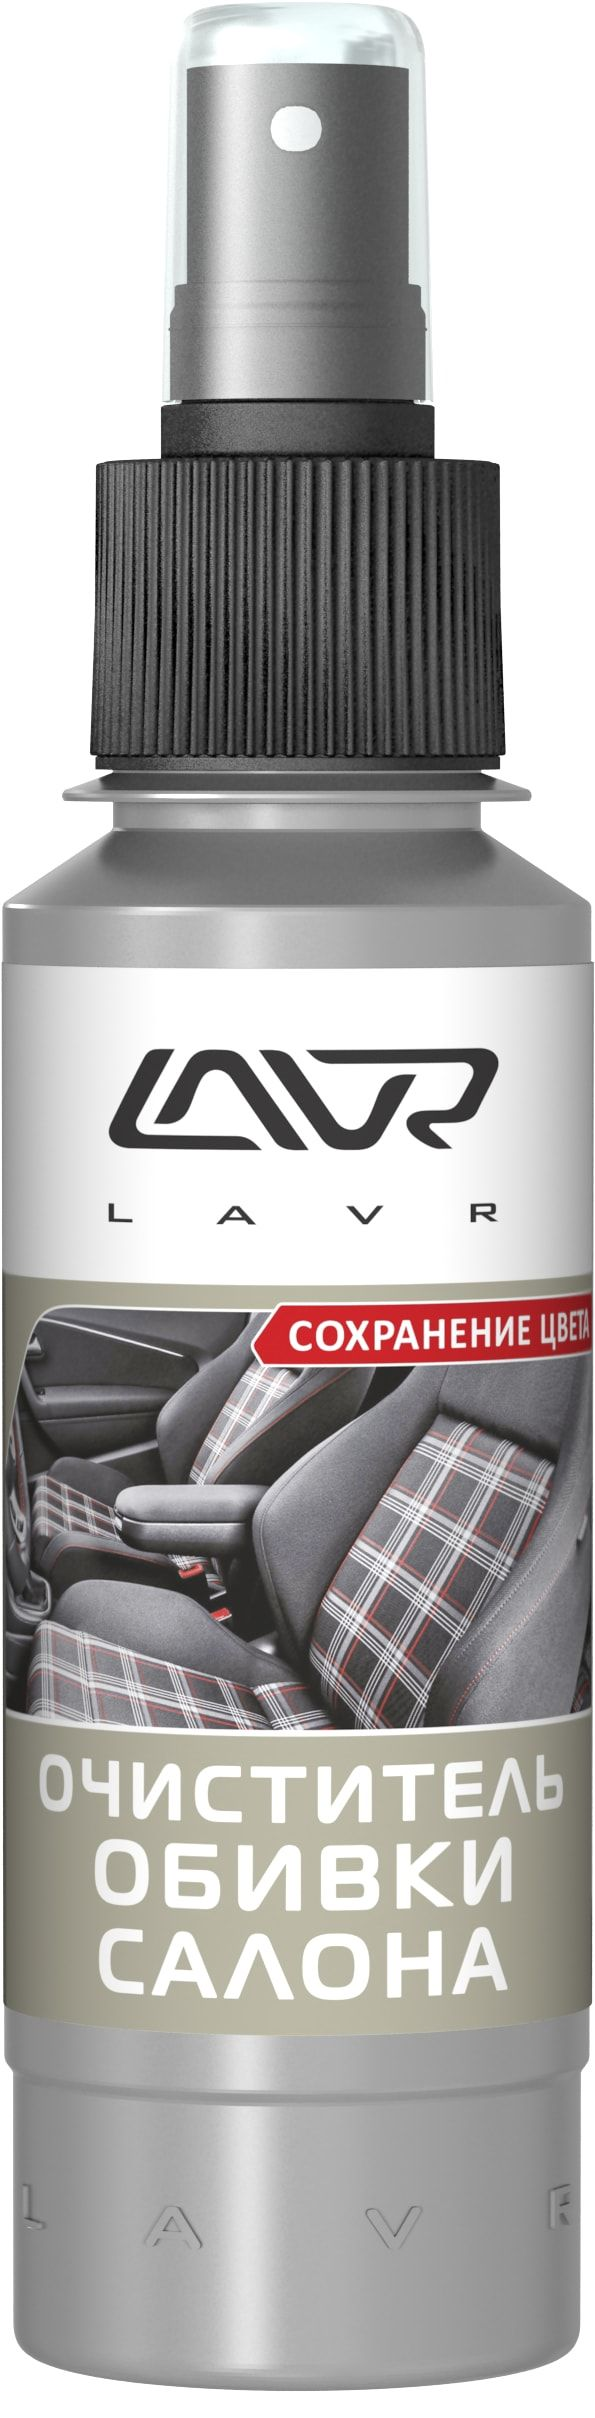 Очиститель обивки салона Lavr Cover Cleaner fresh foam 120 мл Ln1446